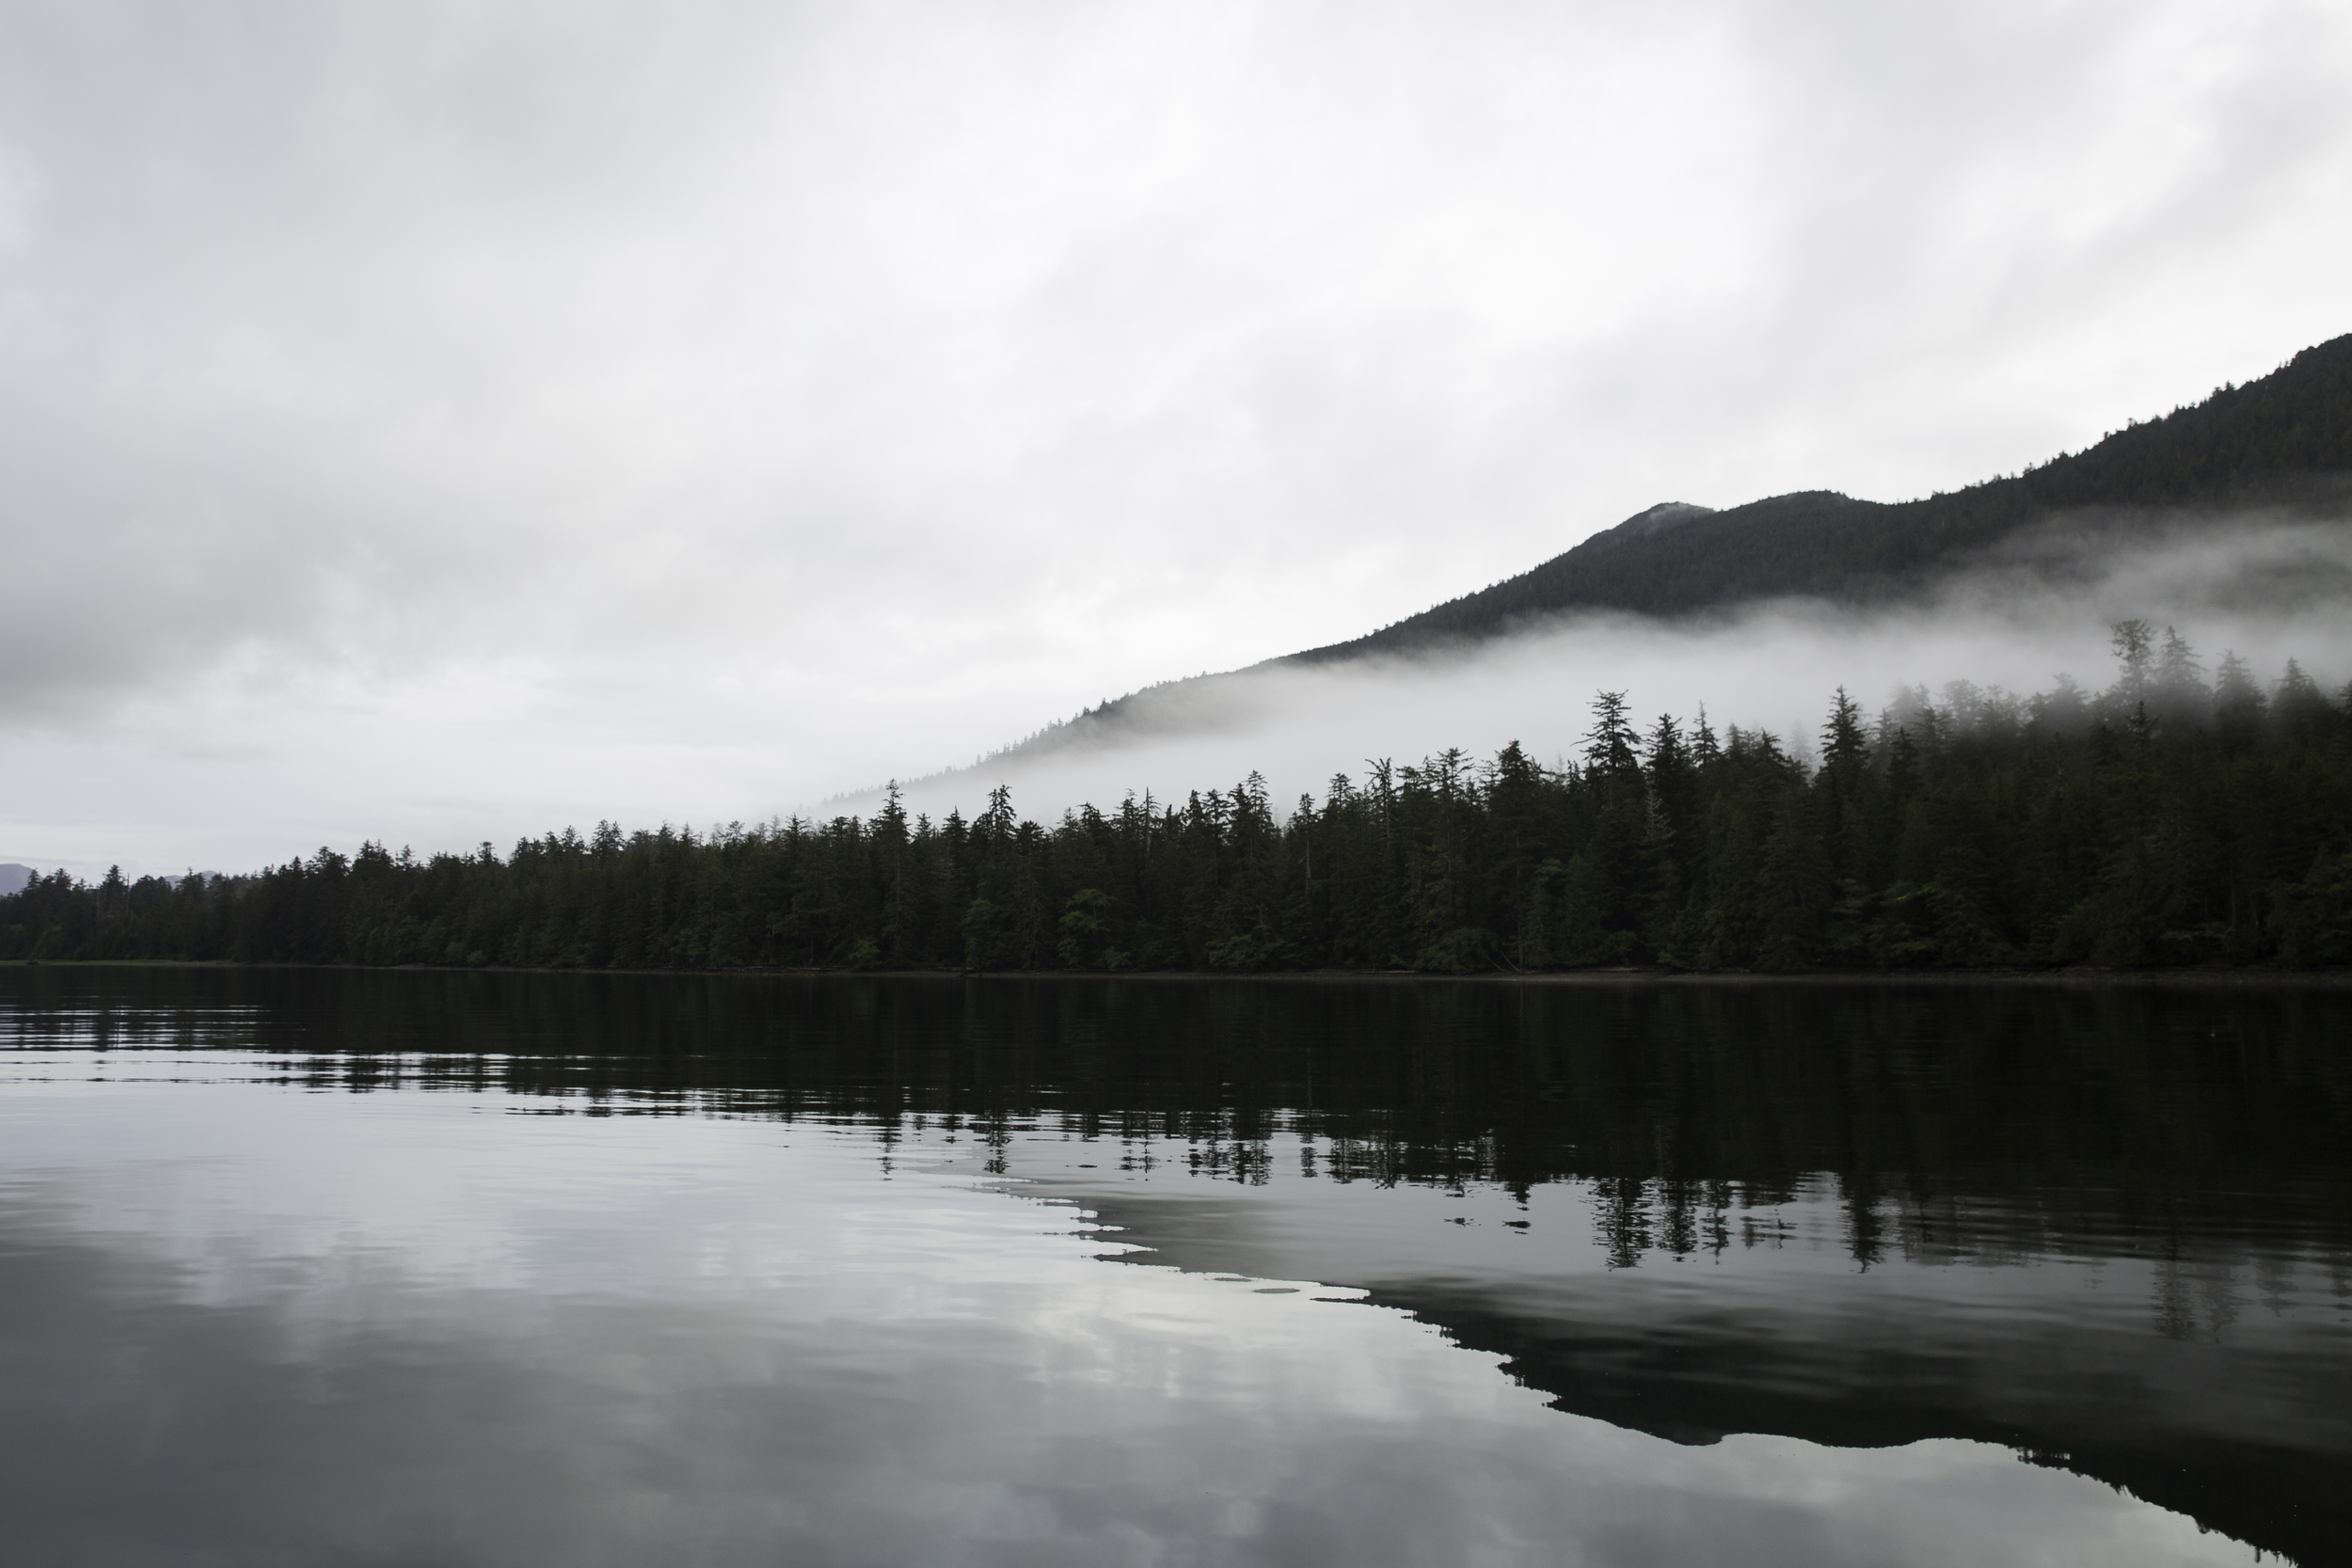 Stillness. Sitka spruce and low cloud.